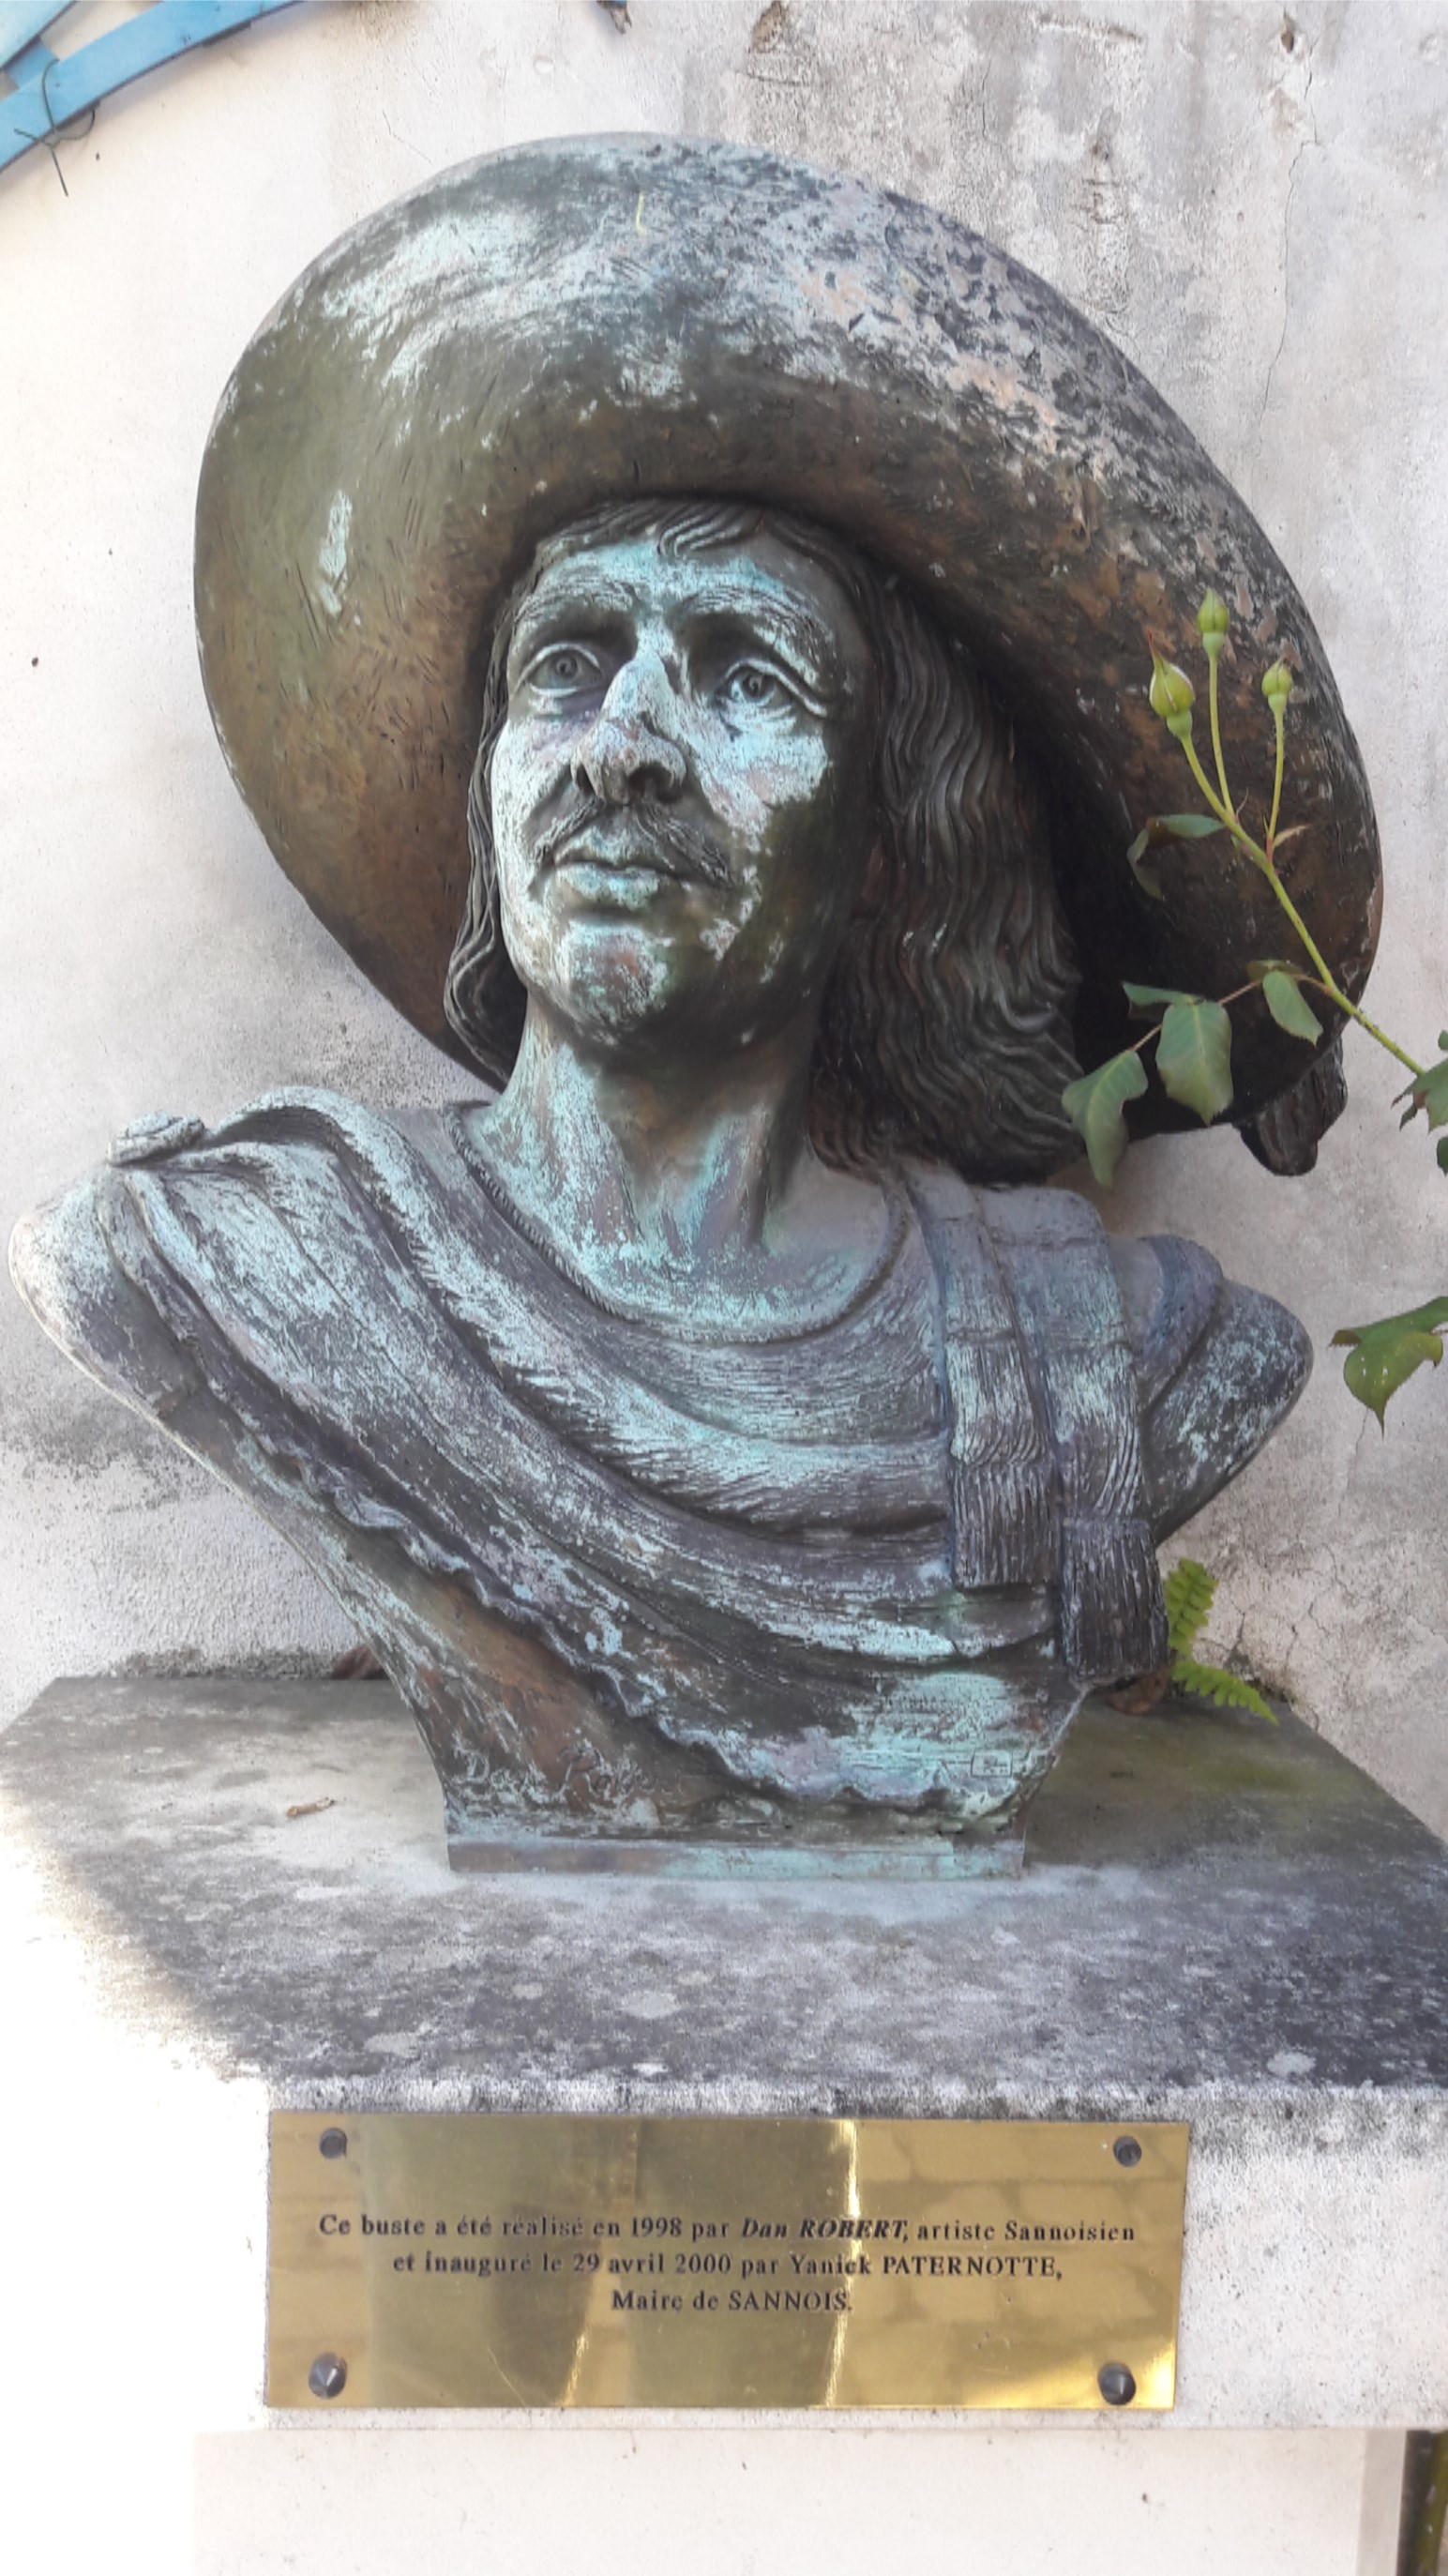 SAVINIEN DE CYRANO DE BERGERAC - Buste de Dan Robert